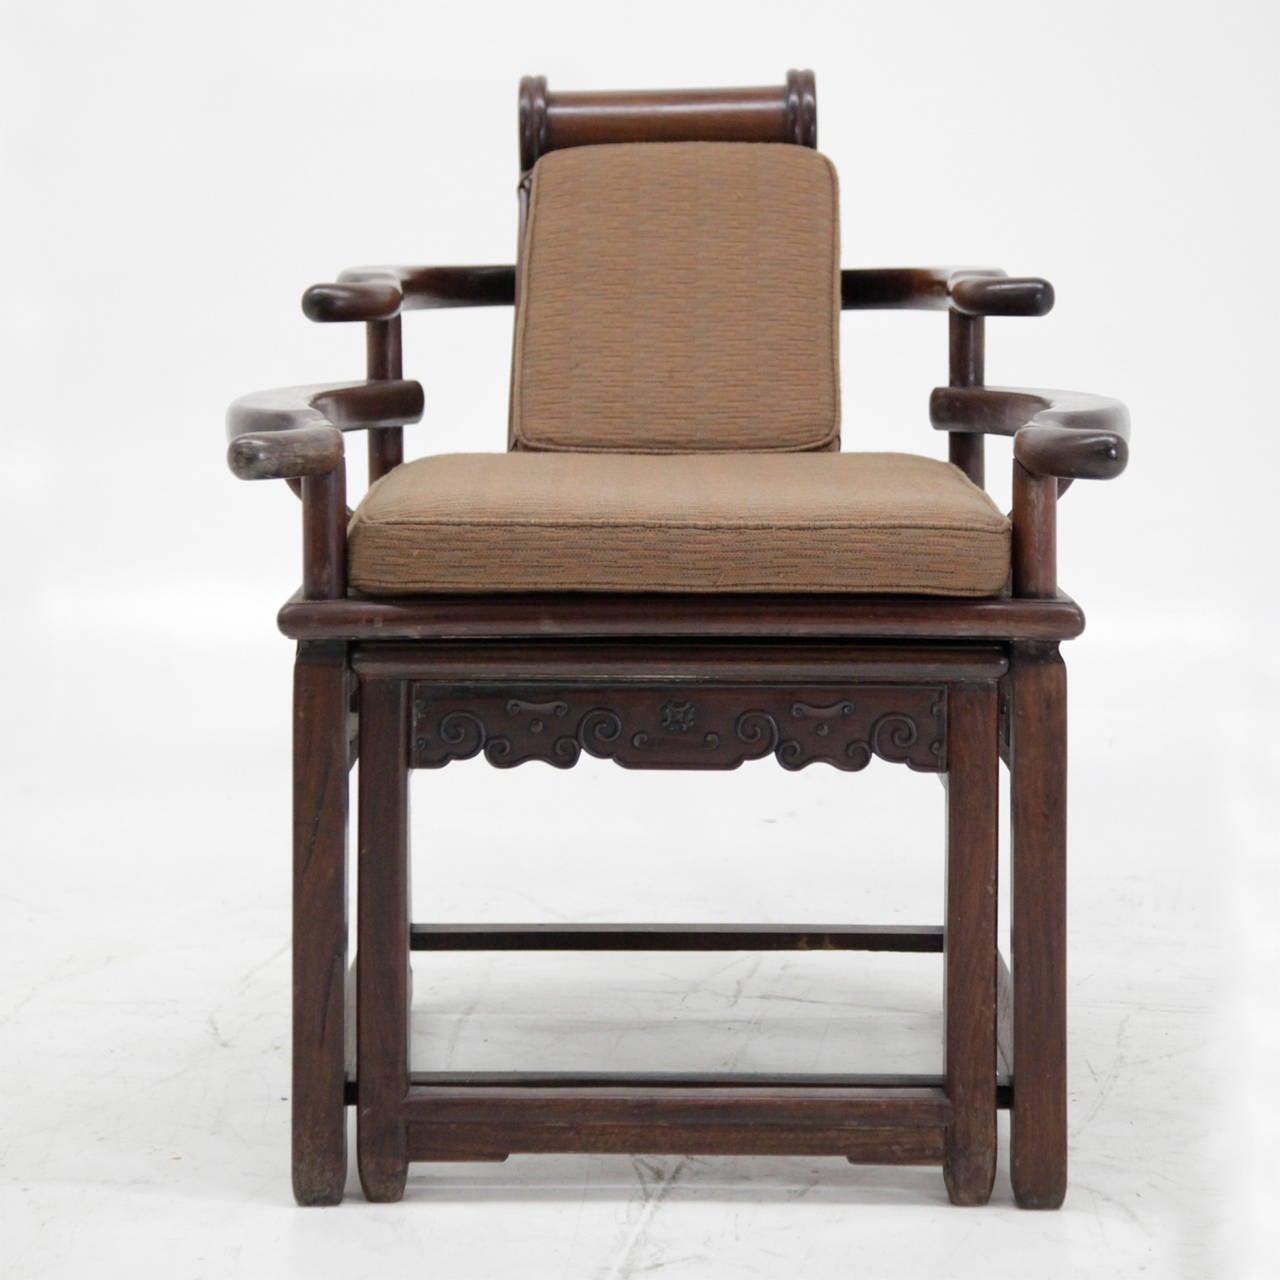 Swell Exceptional Asian Recliner Or Deck Chair Circa 1900 1910 Creativecarmelina Interior Chair Design Creativecarmelinacom